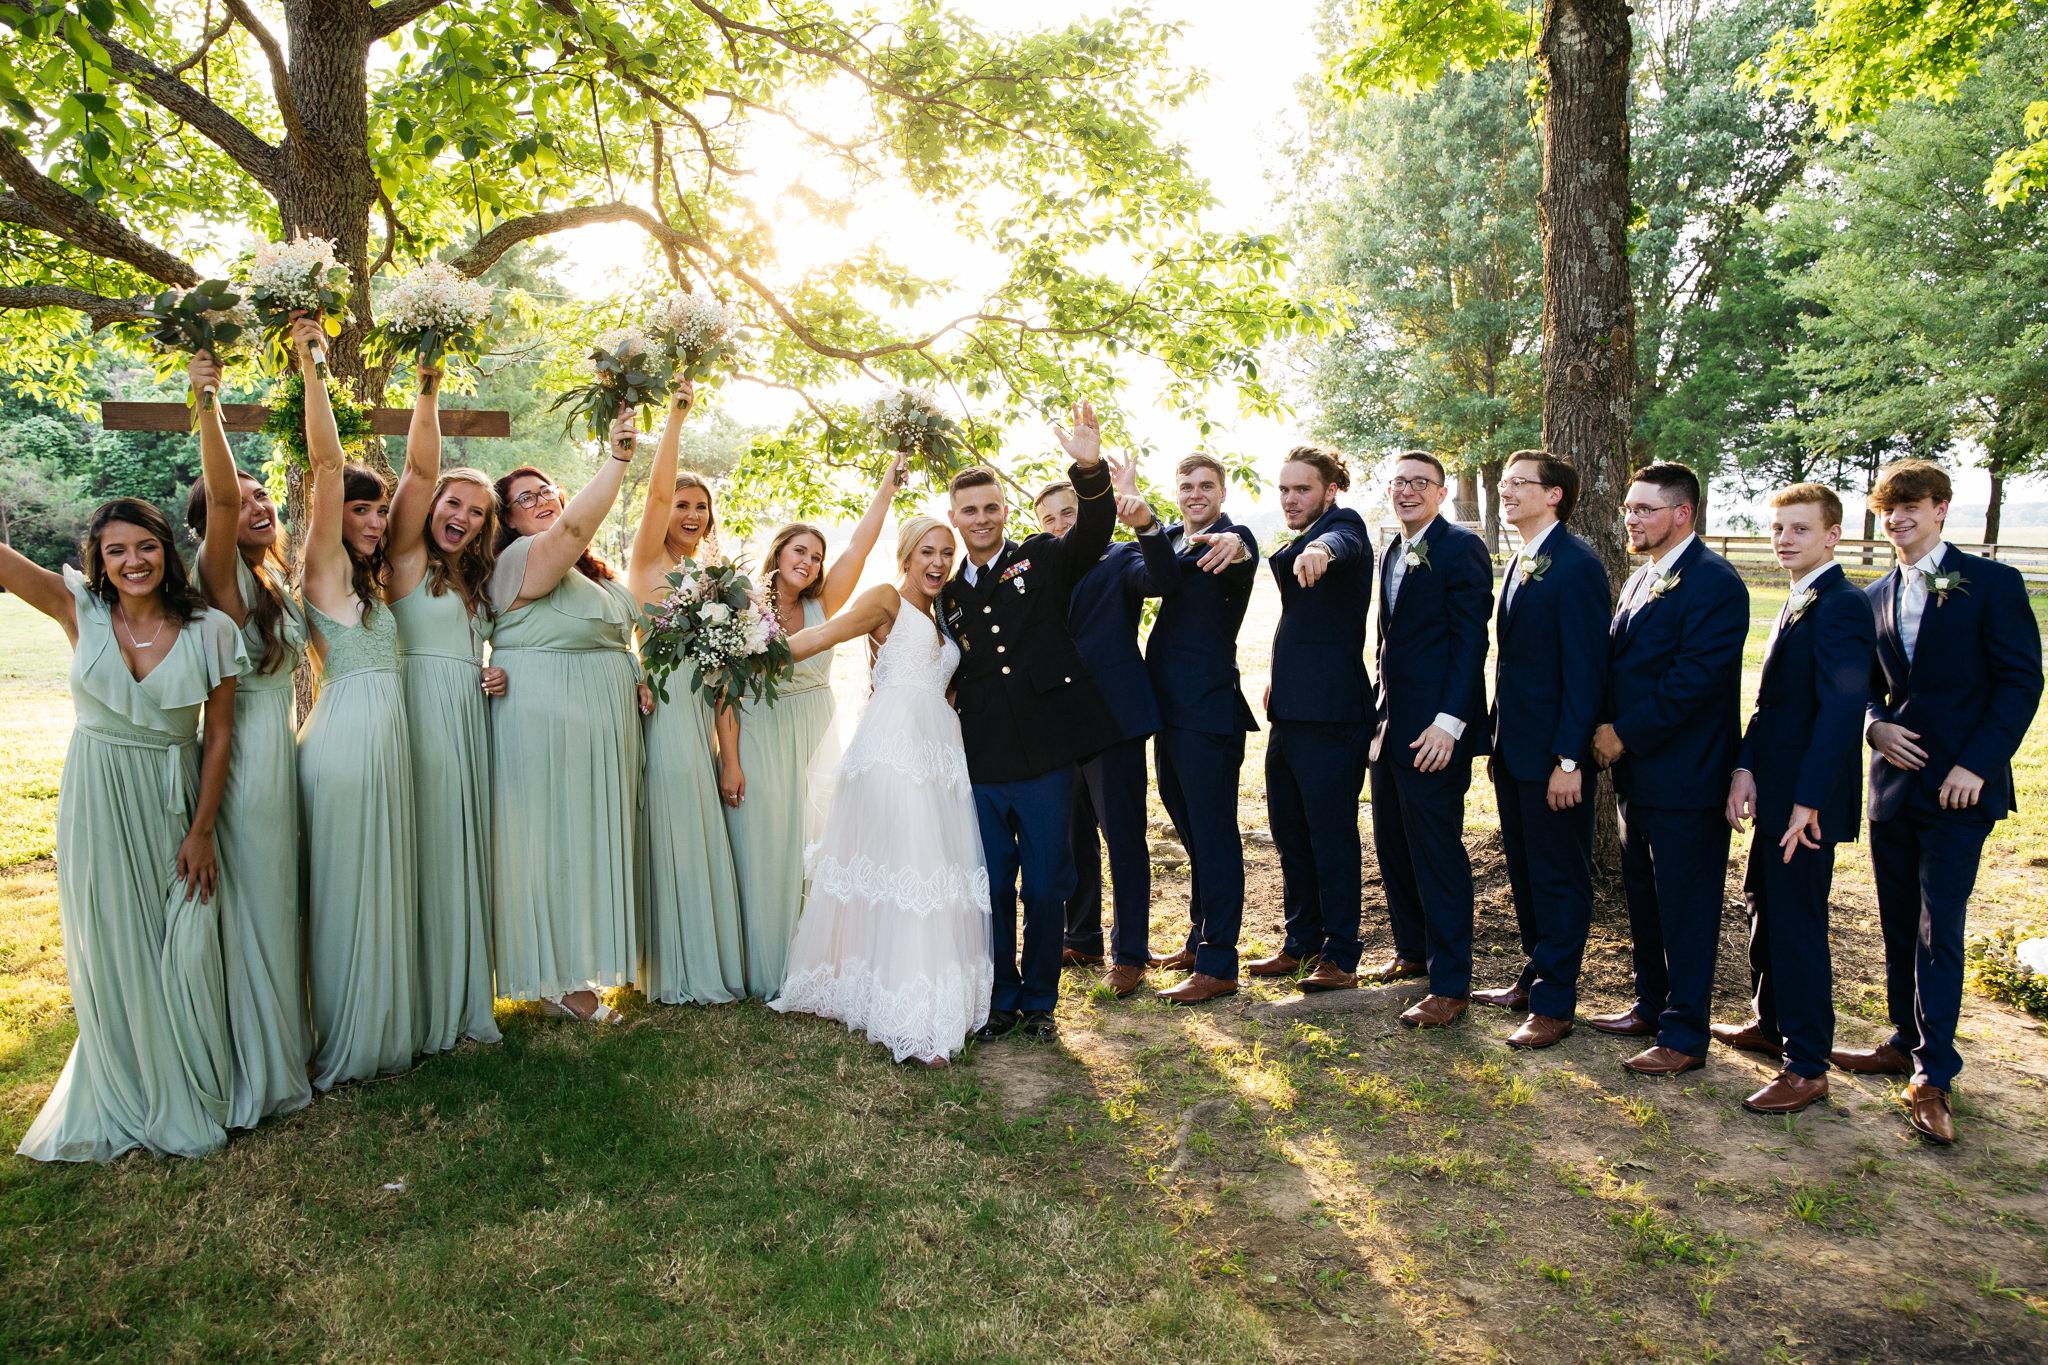 backyard-wedding-thewarmtharoundyou-lexy-branson-6.jpg